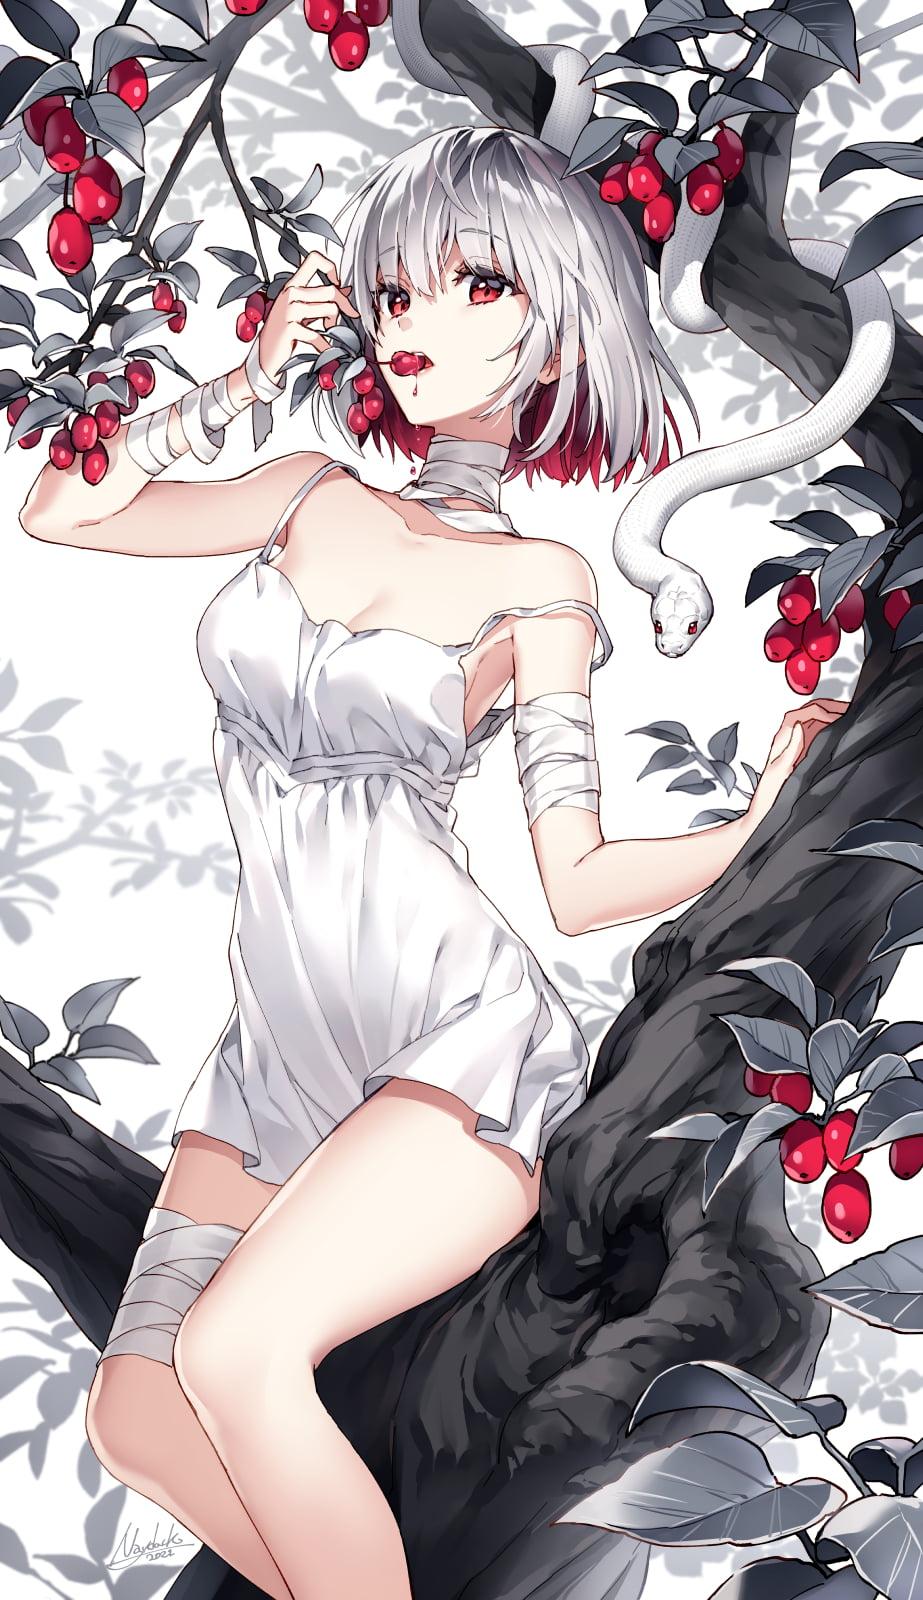 Anime Anime Girls Artwork Multi Colored Hair Short Hair Bangs Red Eyes Bandages White Dress Trees An 923x1600